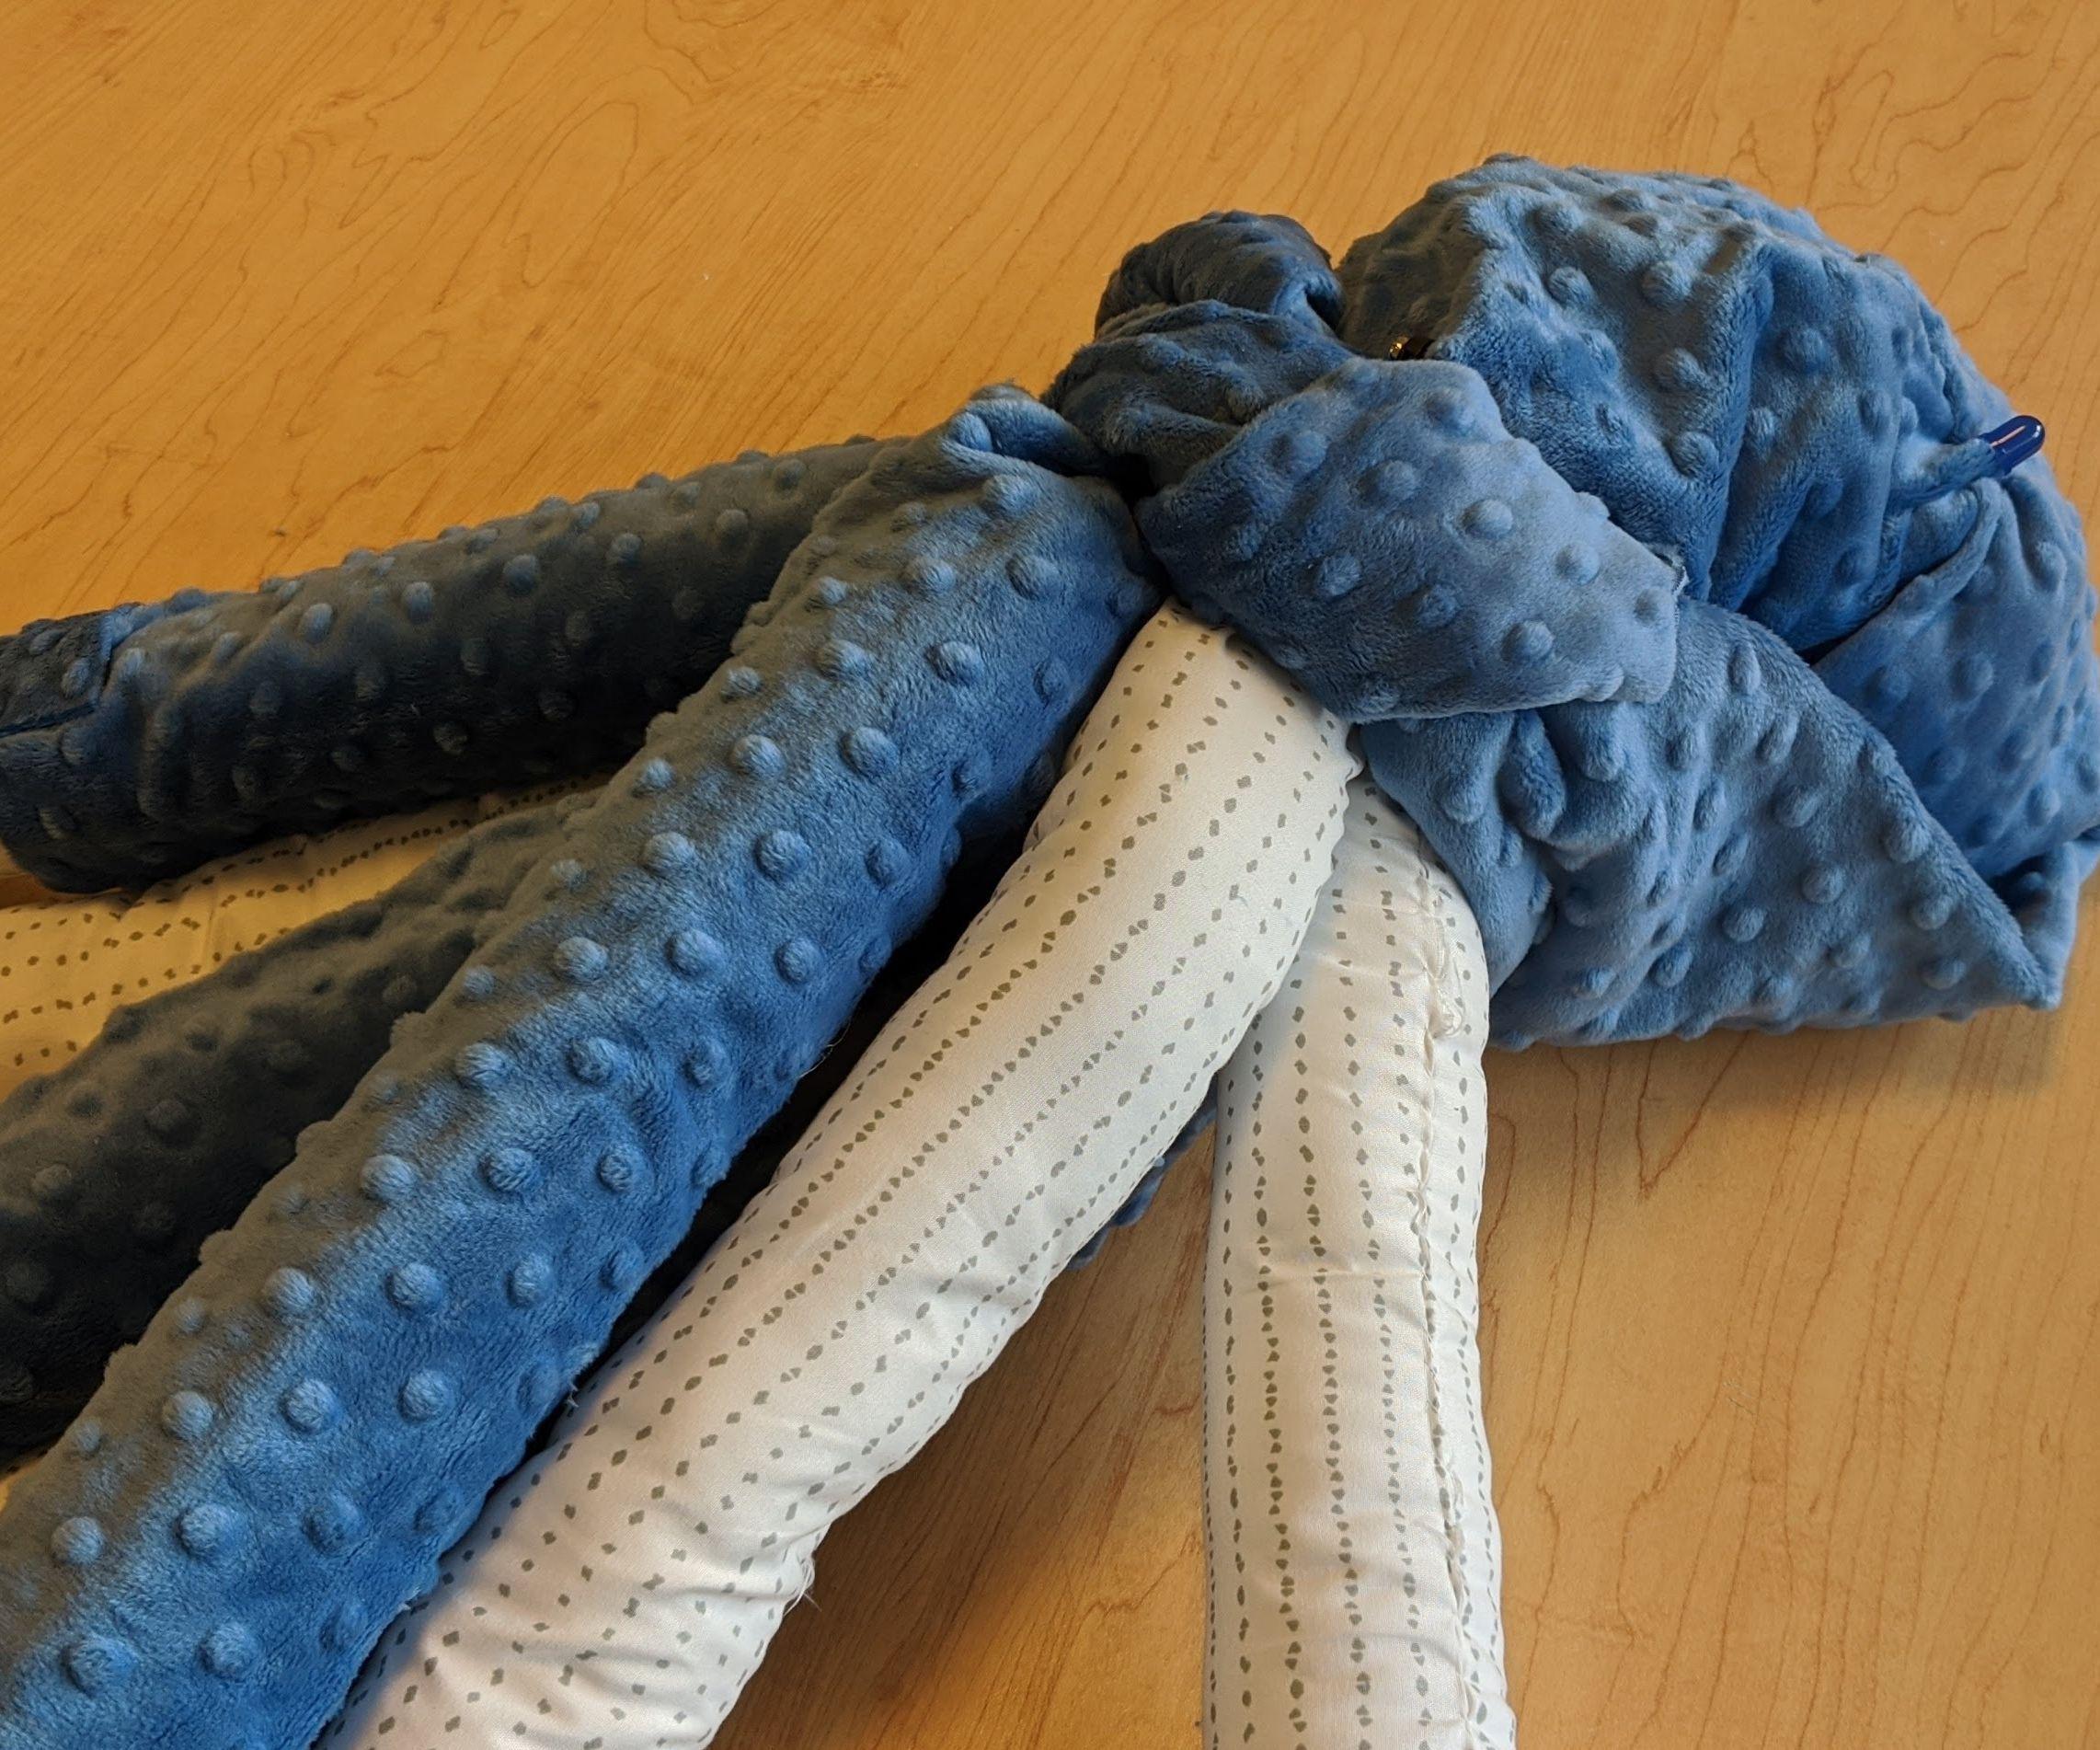 Octo-hugs: a *Huggable* Octopus Plush Toy